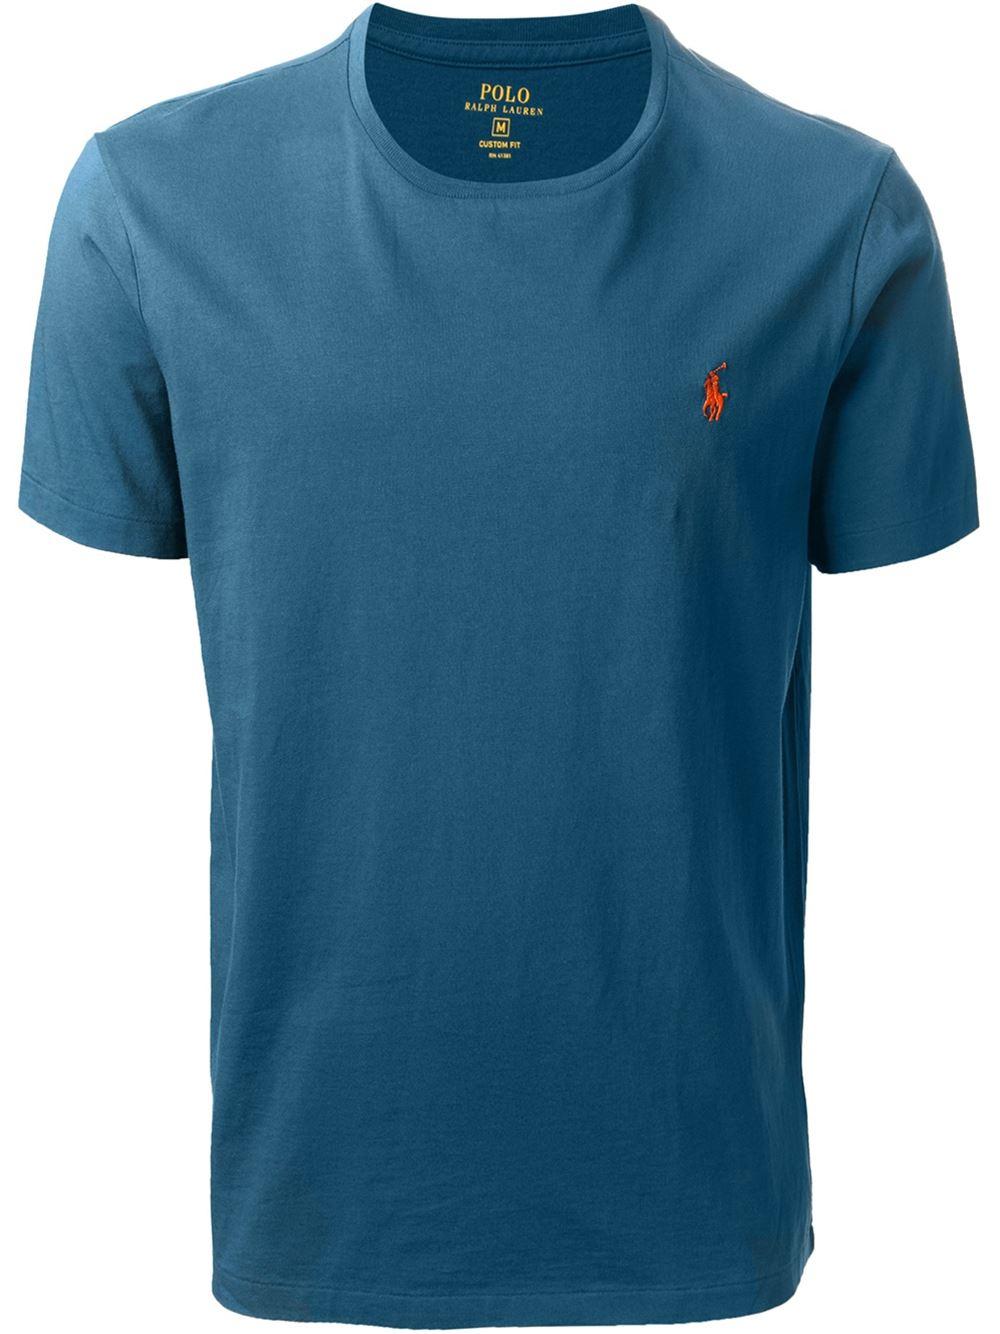 Lyst polo ralph lauren custom fit t shirt in blue for men for Polo custom fit t shirts